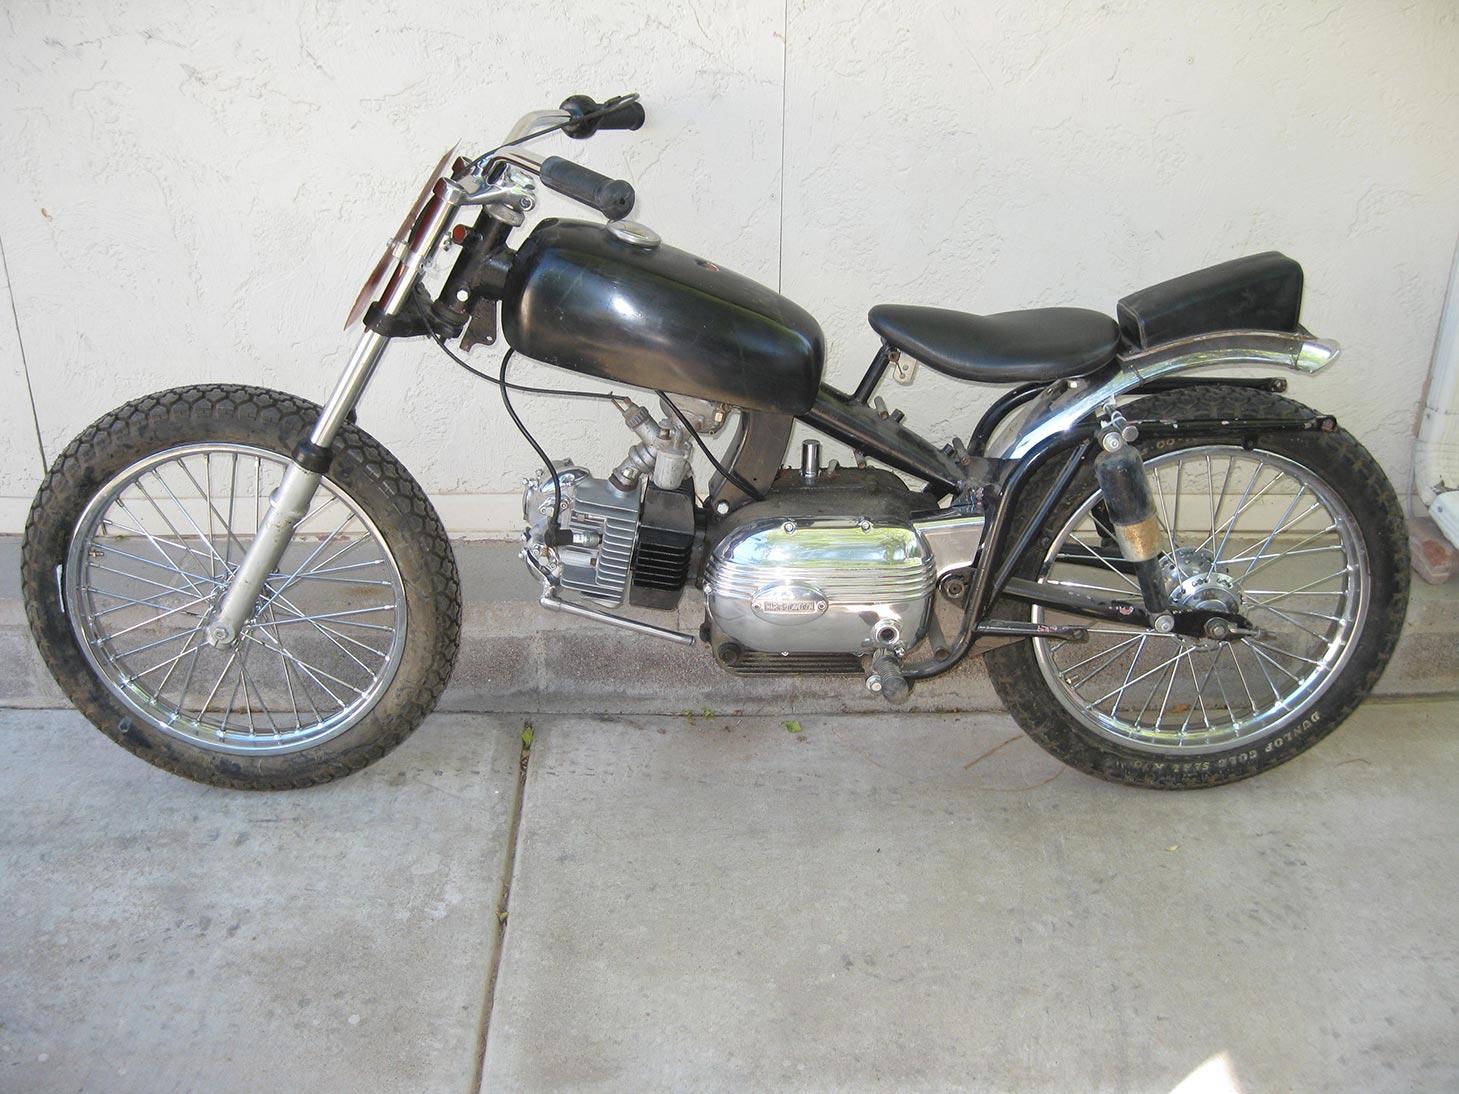 harley davidson 250 sprint motorcycle motorjdi org rh motorjdi org 1965  Harley-Davidson 250Cc Sprint 1968 Harley-Davidson Sprint 250